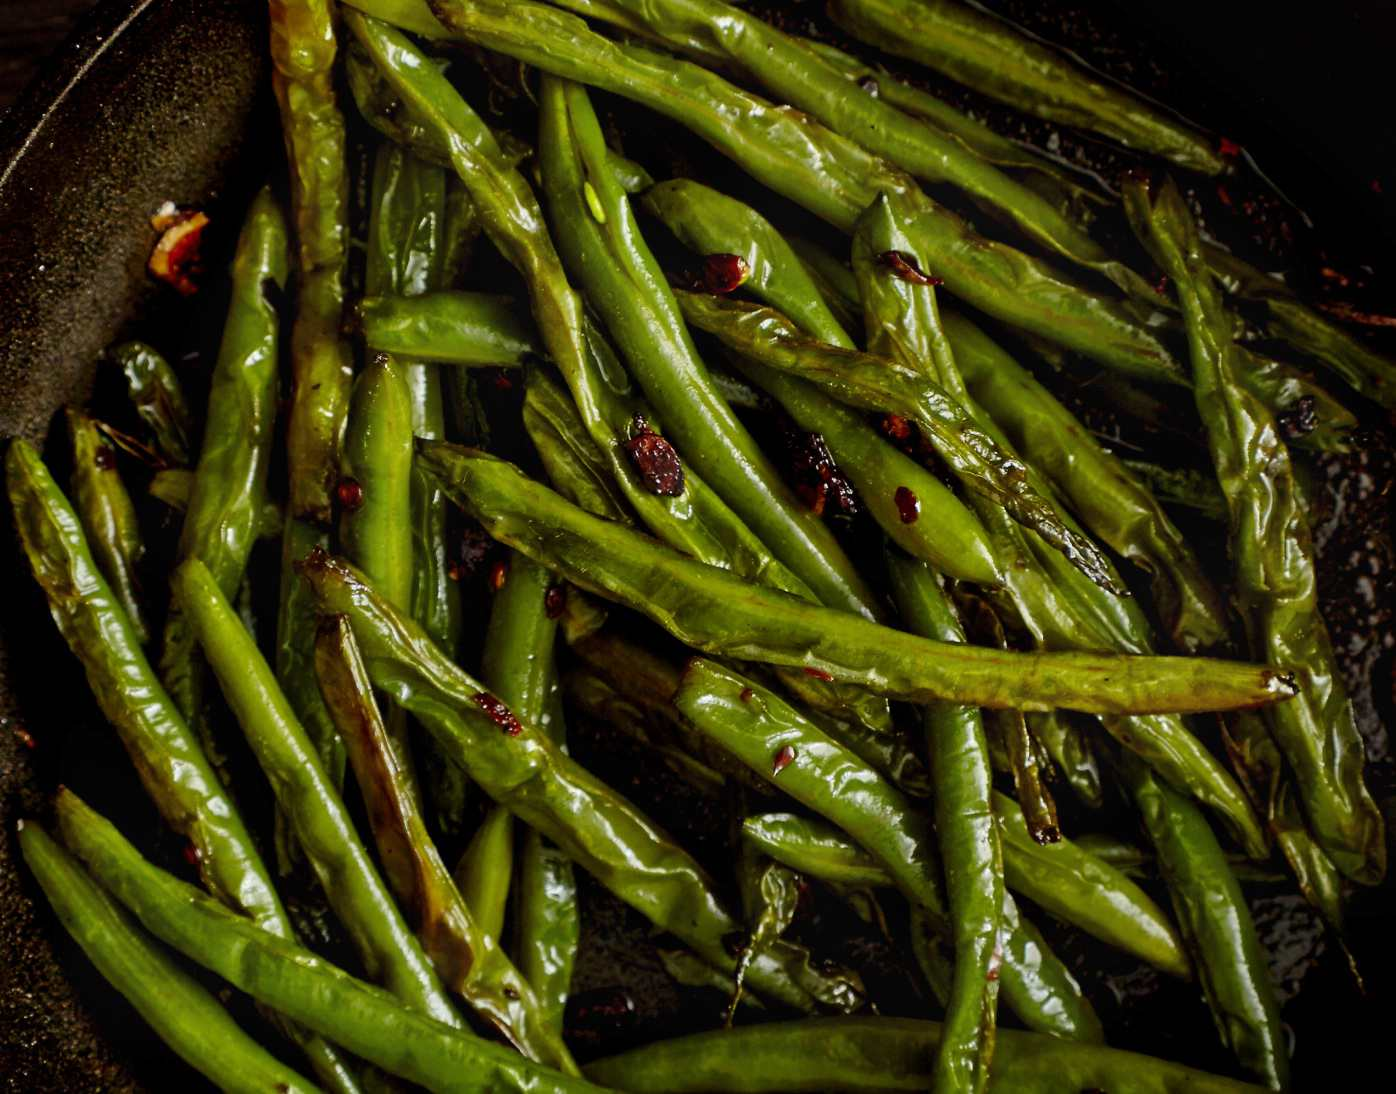 Sauteed Asian green beans